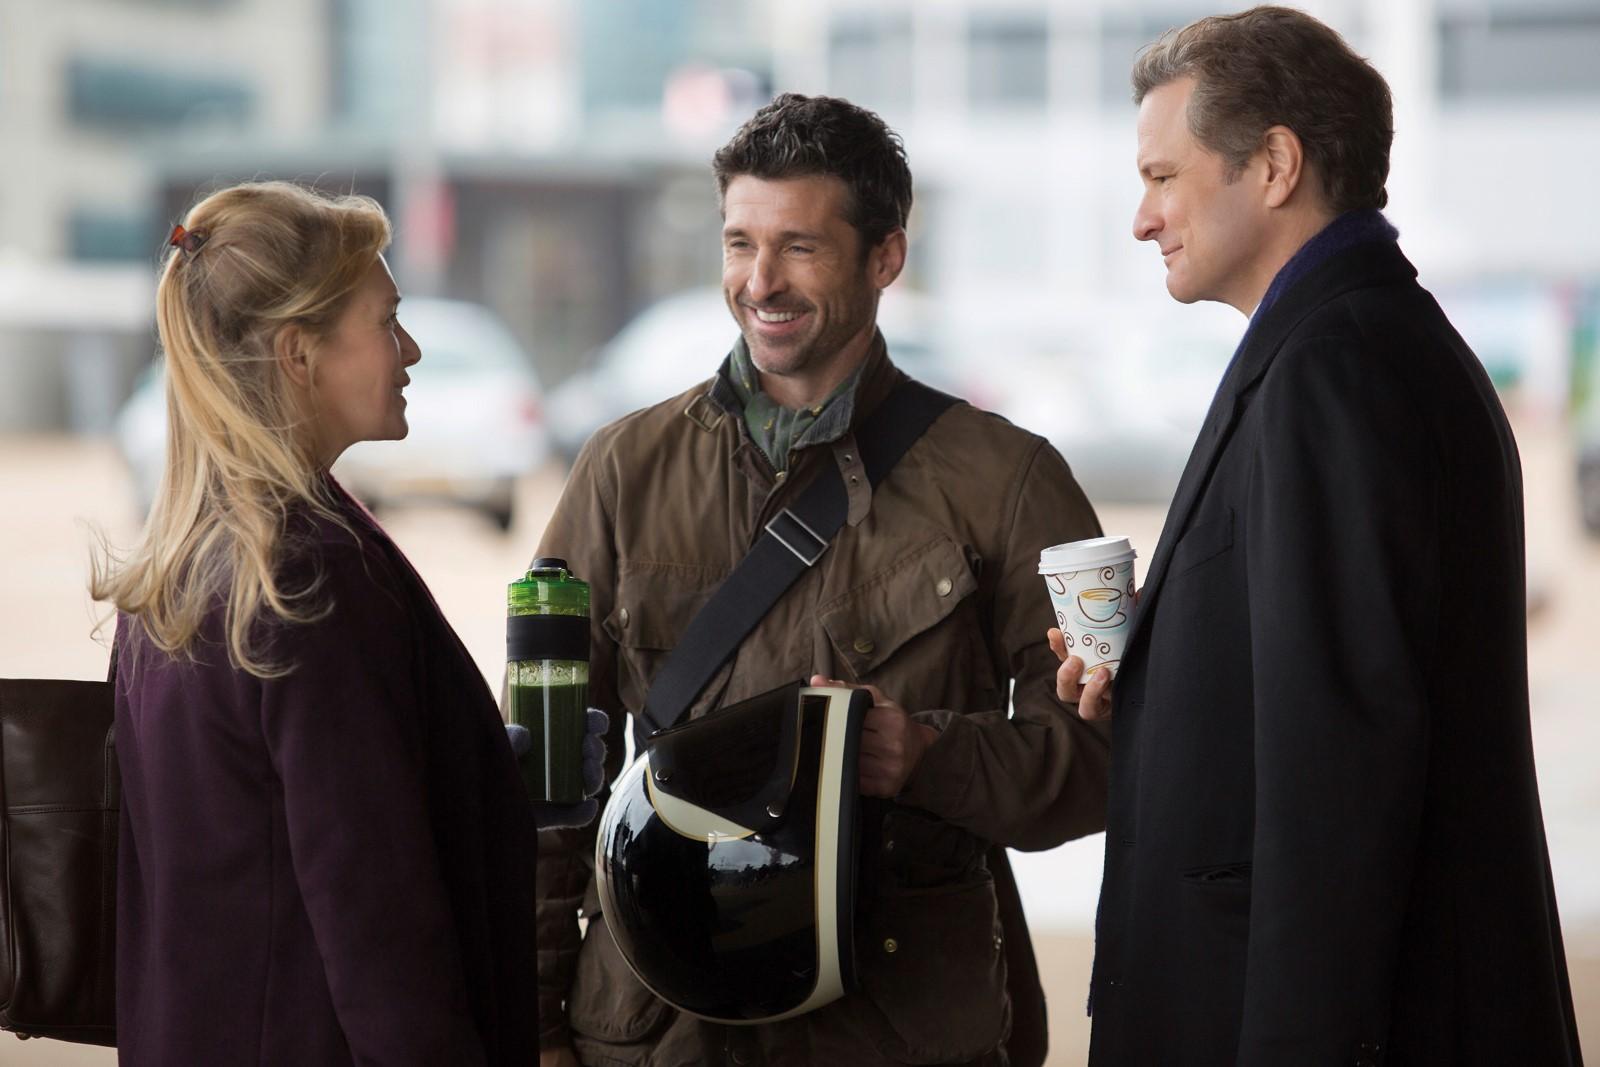 Bridget Jones Baby - Renée Zellweger, Patrick Dempsey, Colin Firth